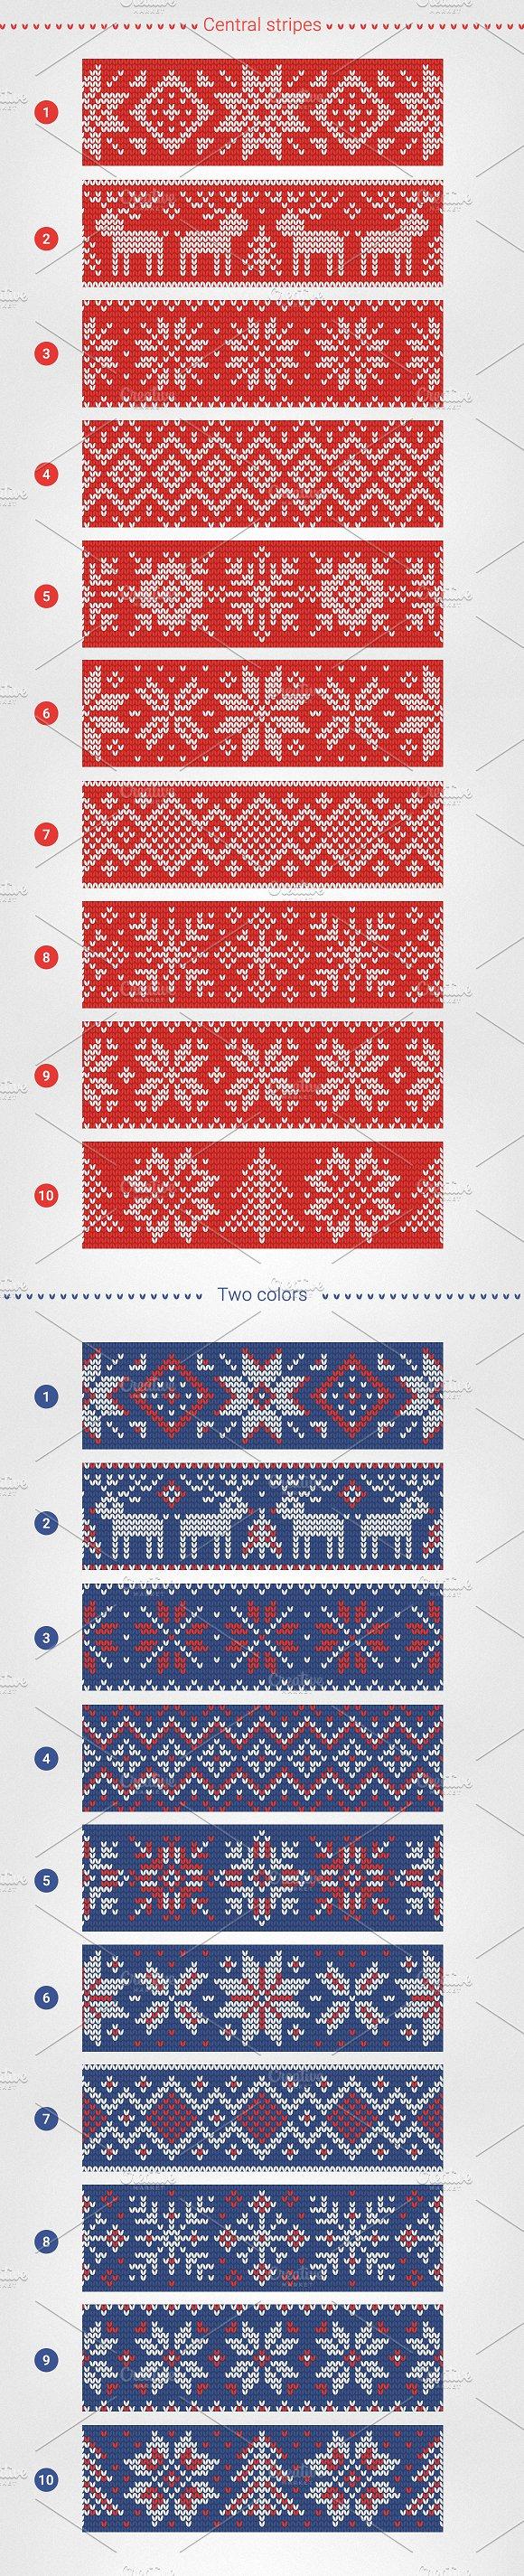 1000 Knitting Patterns Generator ~ Graphic Patterns ~ Creative Market